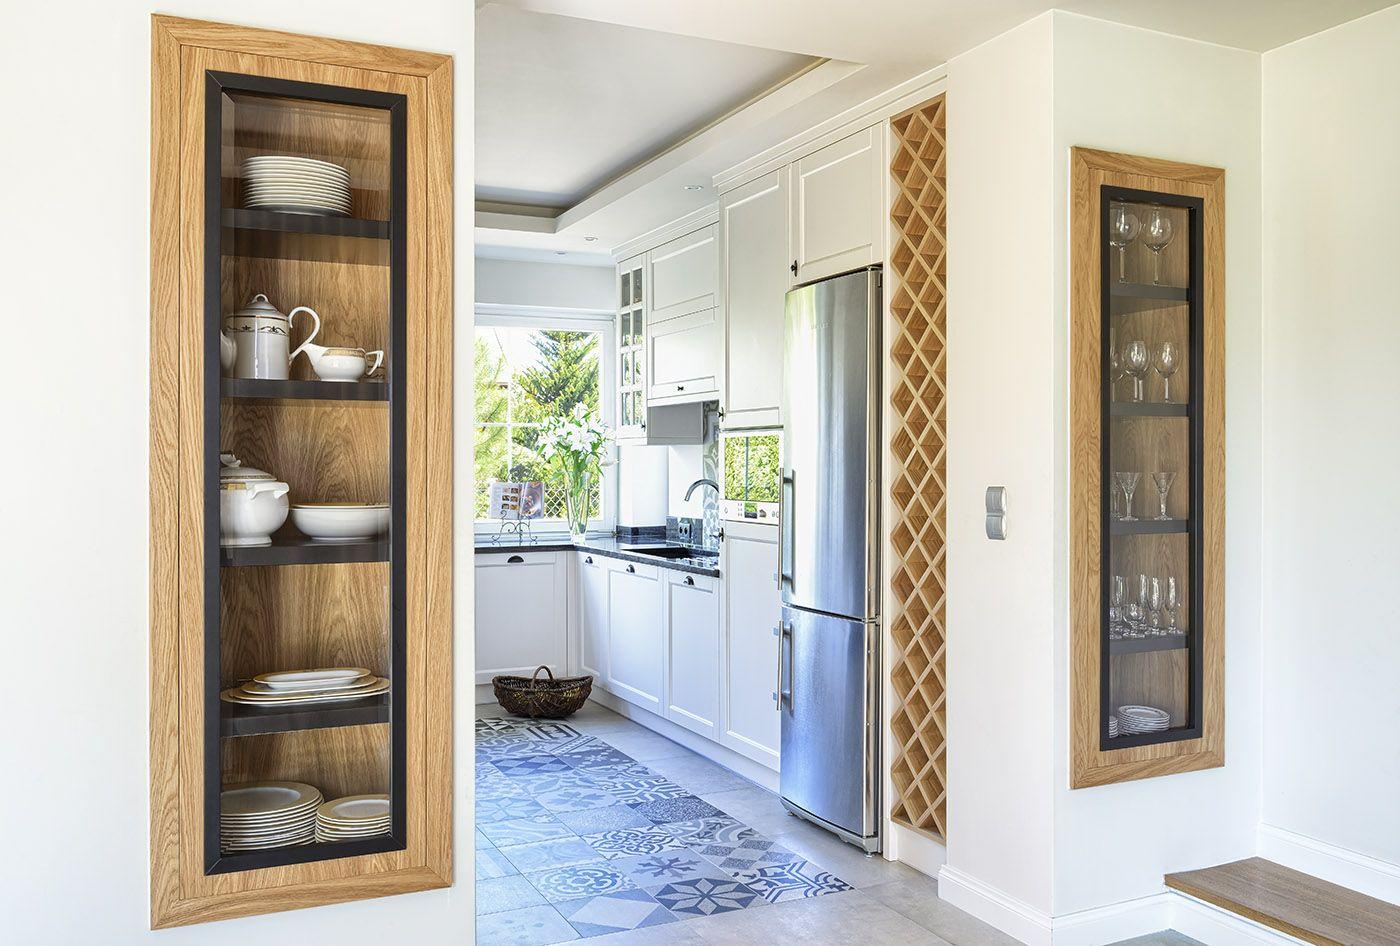 Kuchnia Za Sciana Home Facebook